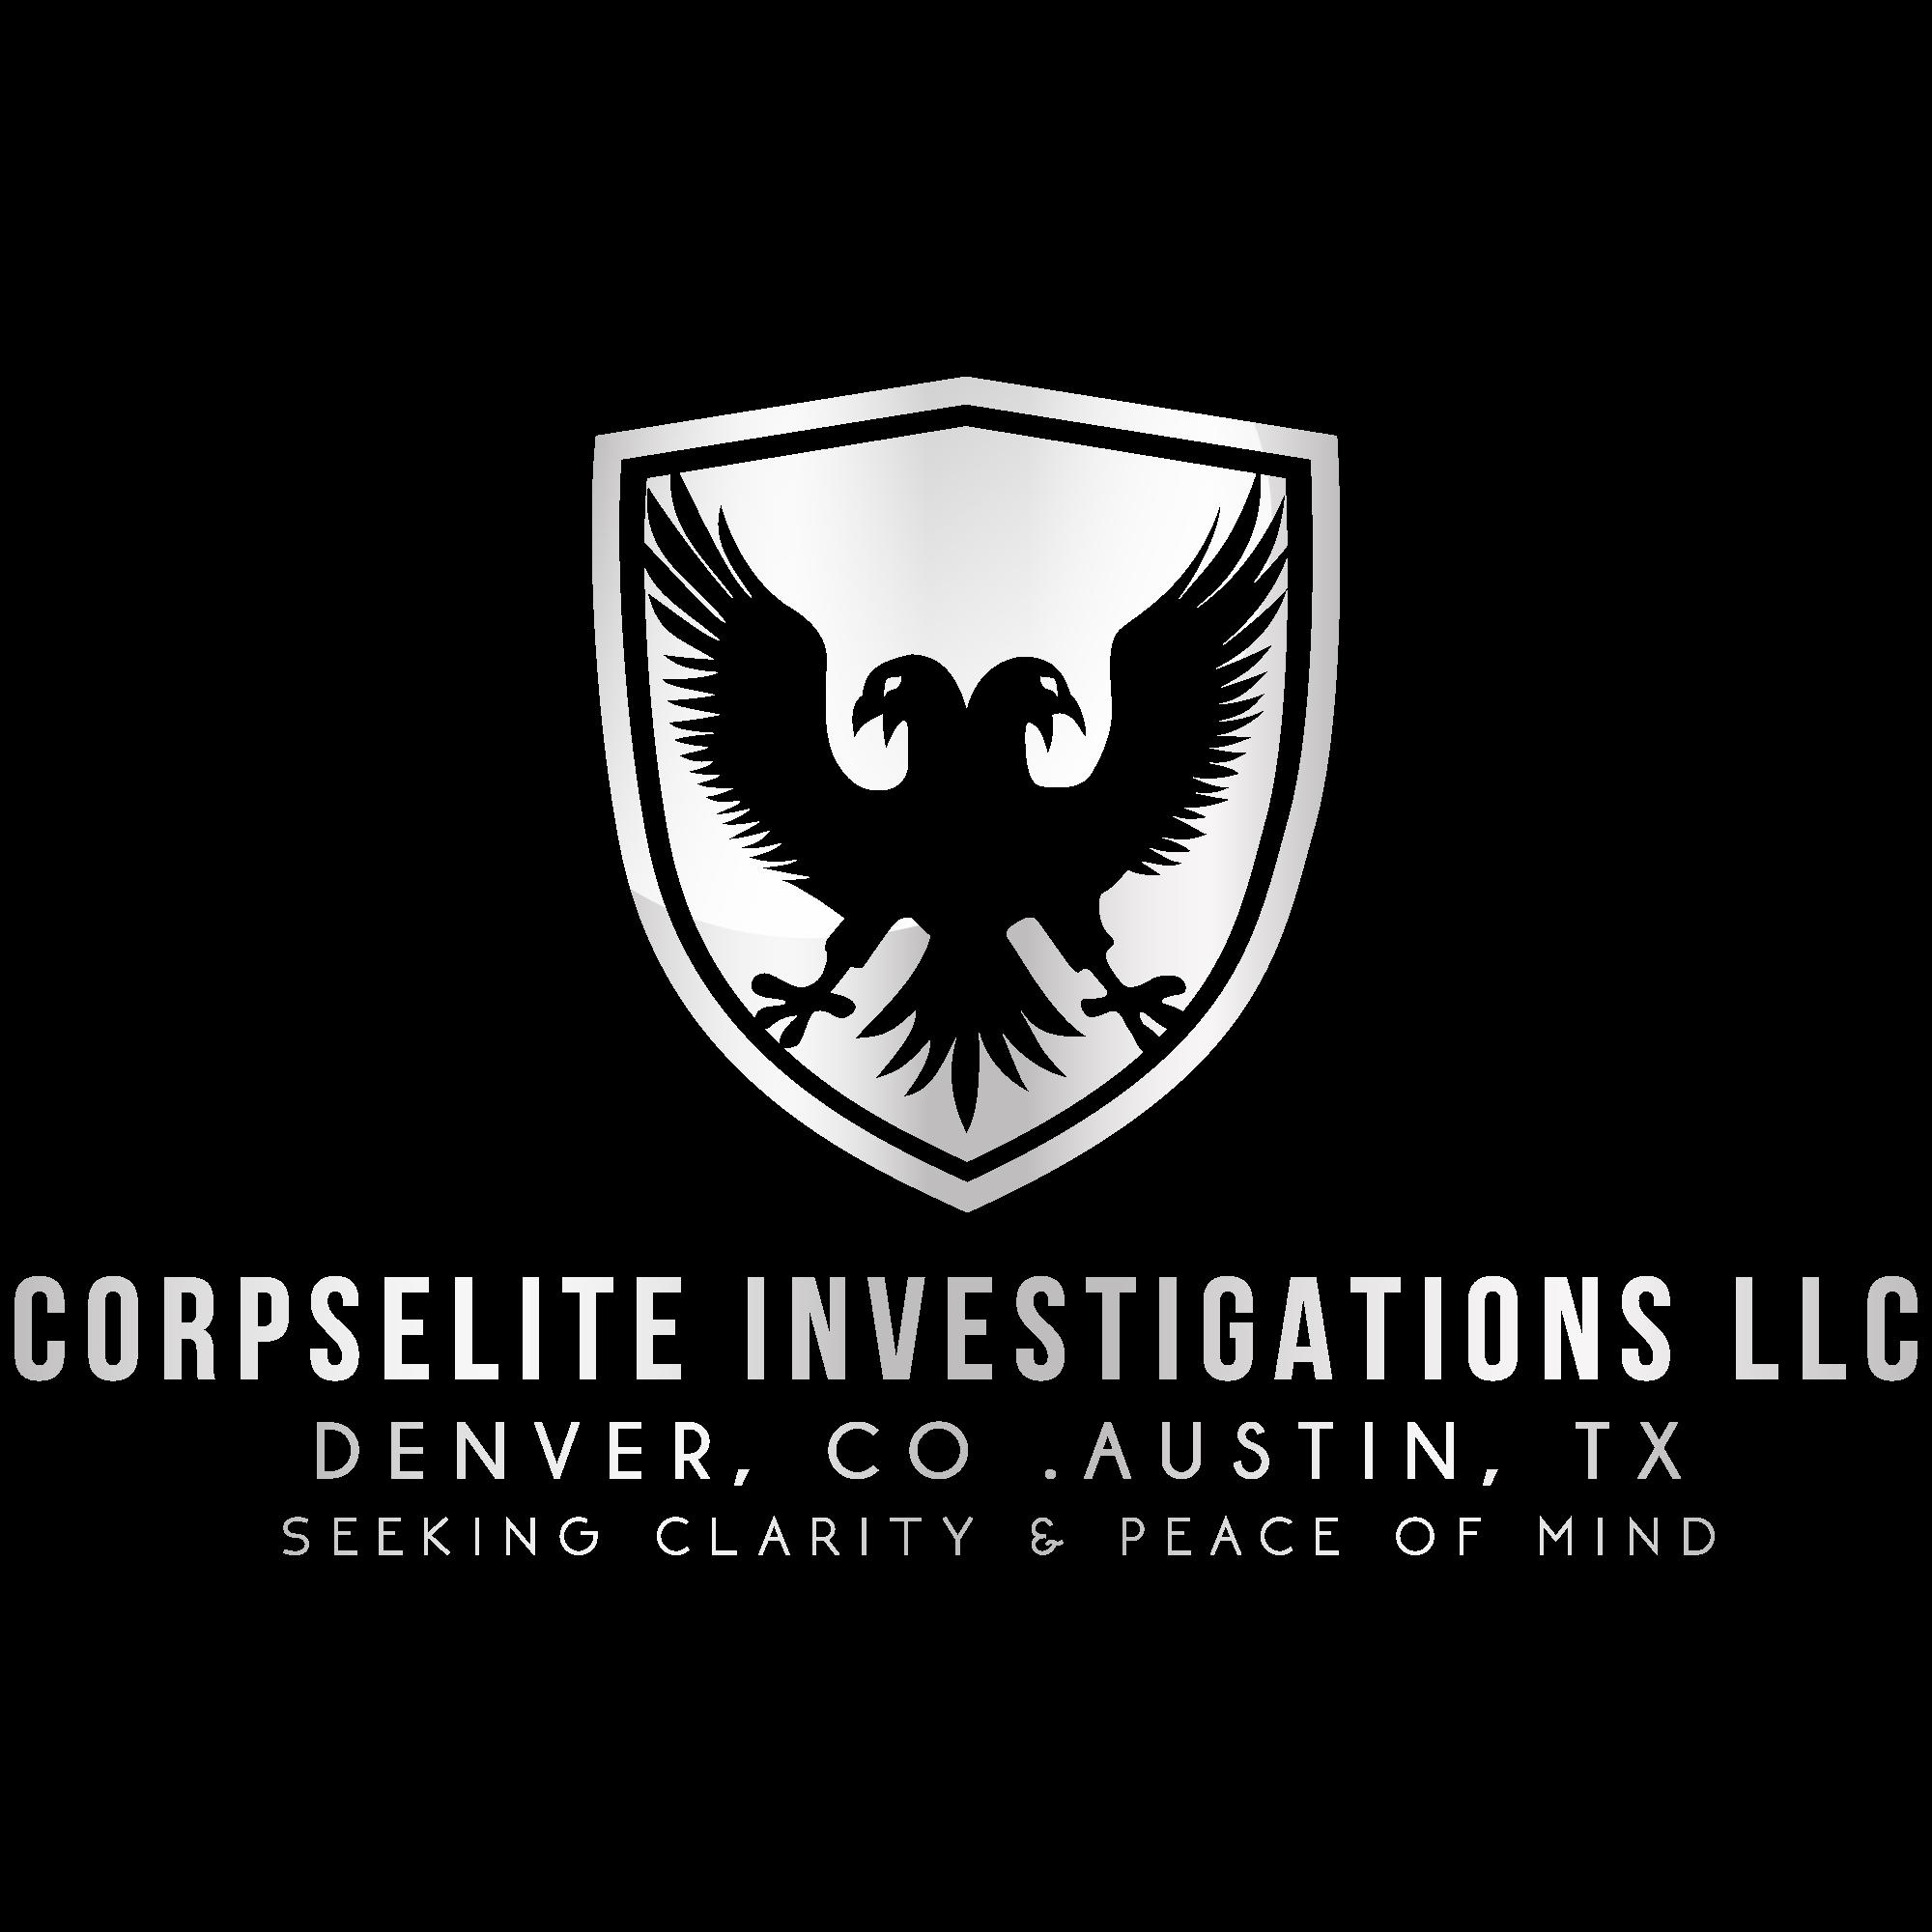 CorpsElite Investigations LLC